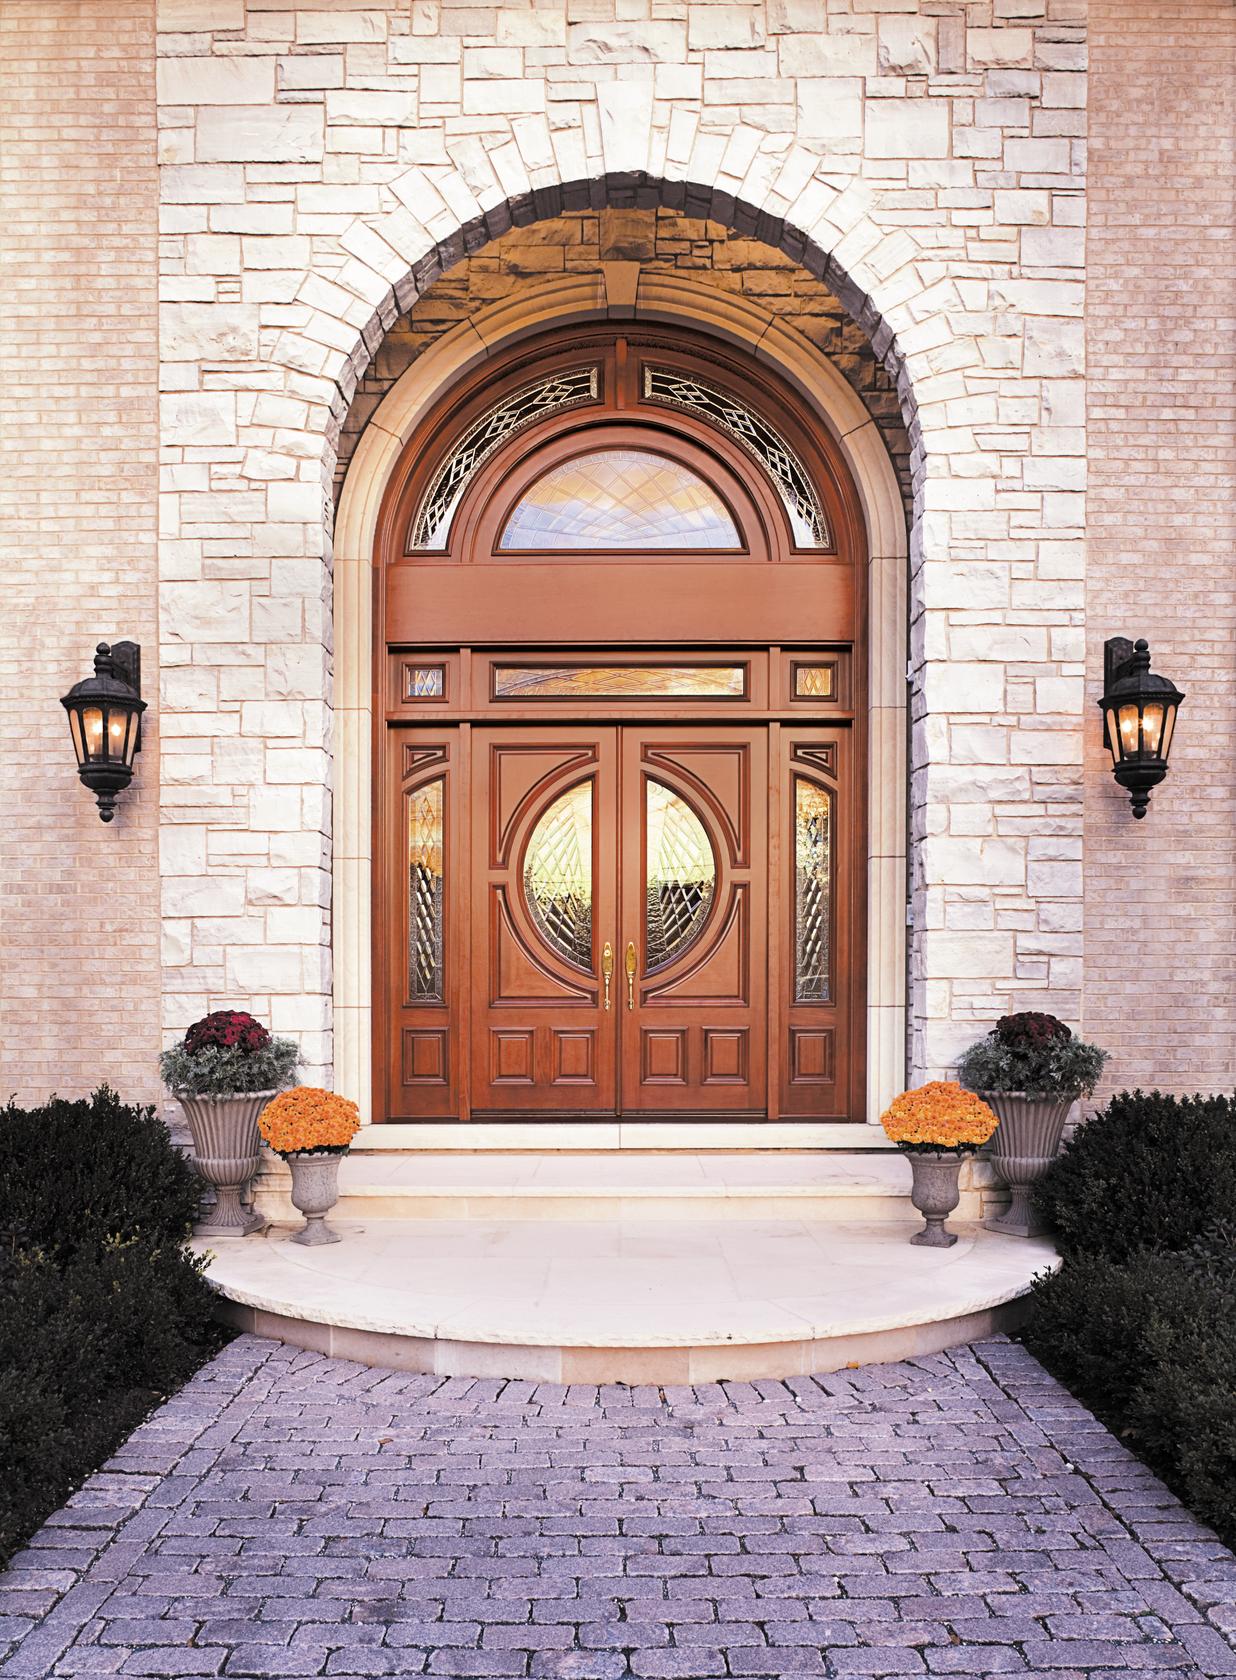 Aurora Custom Fiberglass Glass Panel Exterior Door Jeld Wen Doors Fiberglass Exterior Doors Exterior Doors Fiberglass Entry Doors